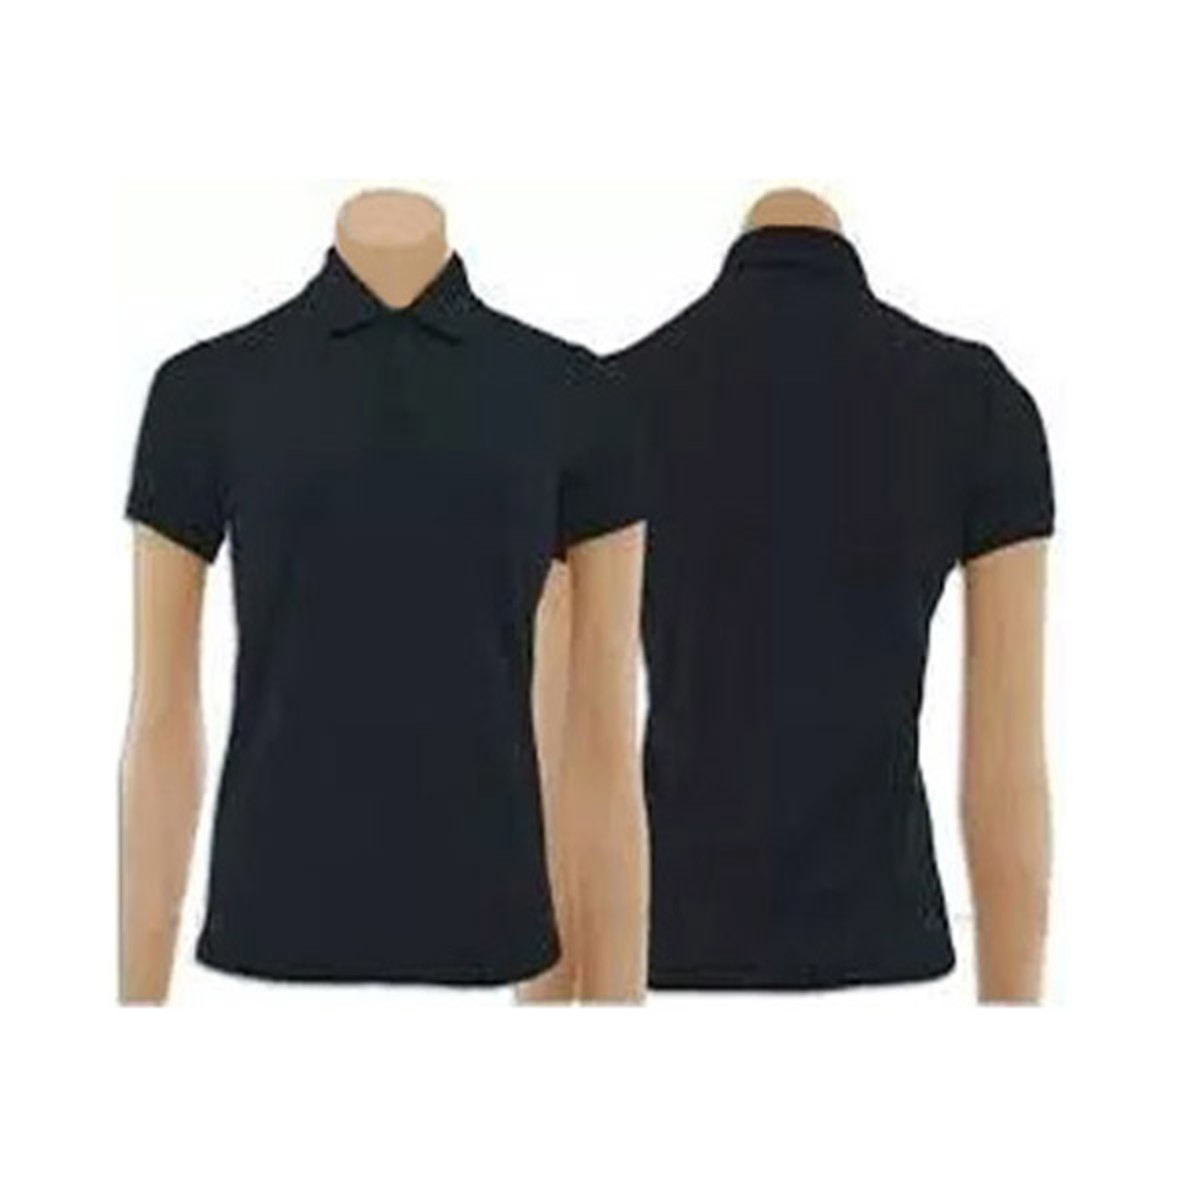 06c3f784cf Camiseta Polo Feminino Preta no Elo7